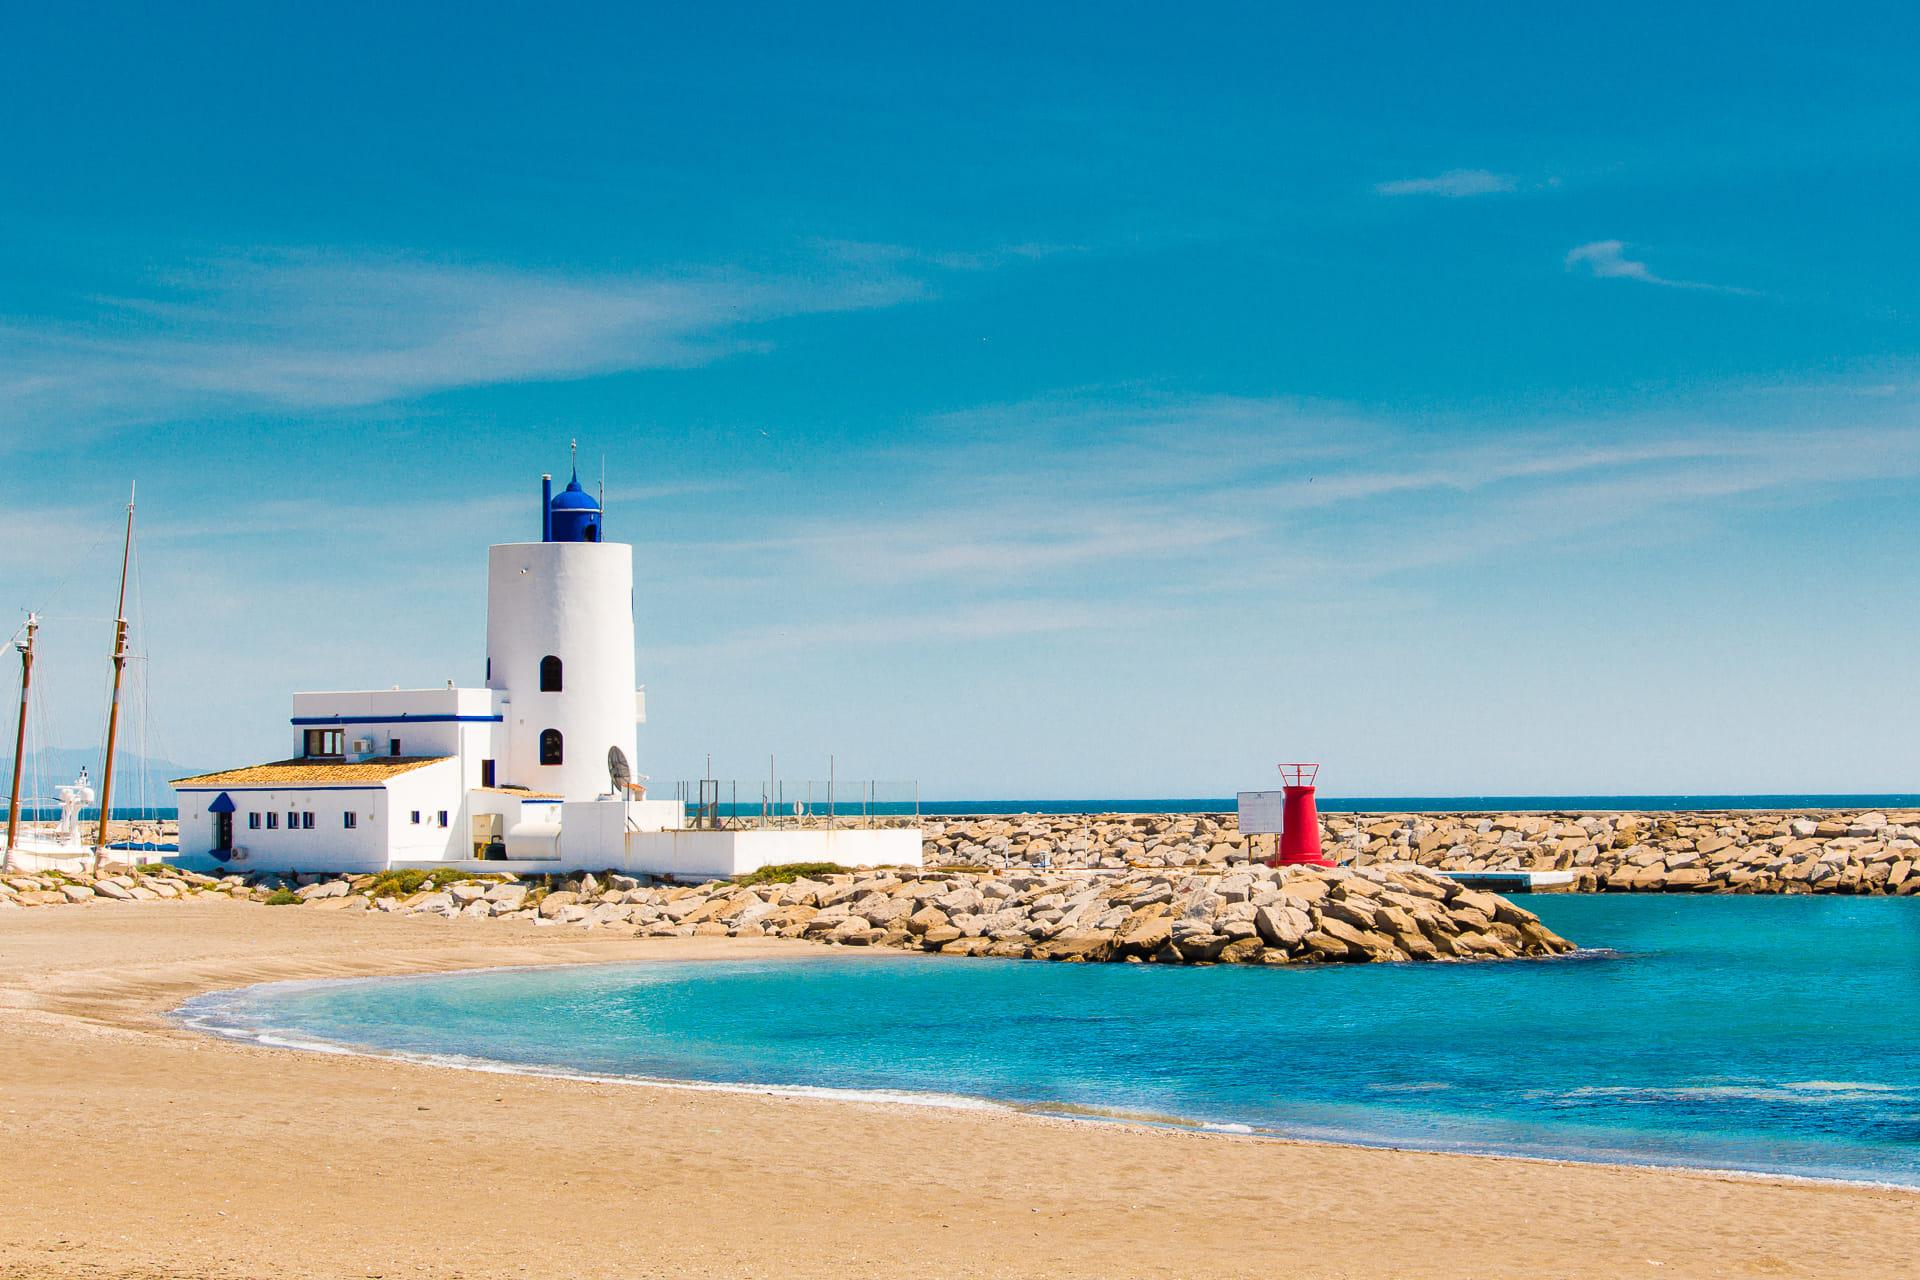 Andalucía infinitesimal. Faro. Puerto de la Duquesa